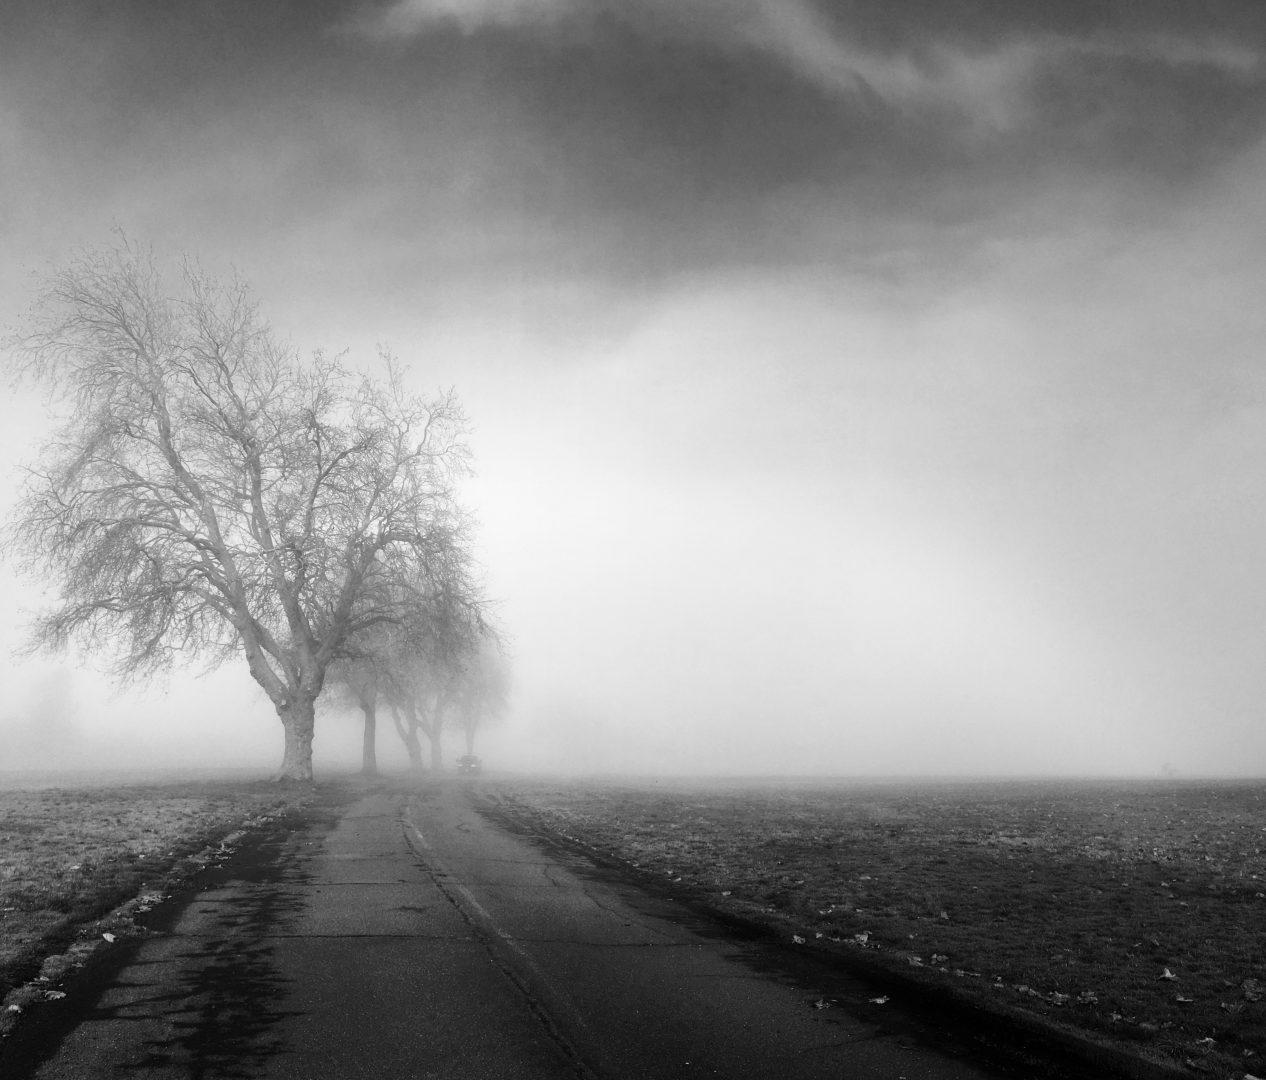 bare tree beside road